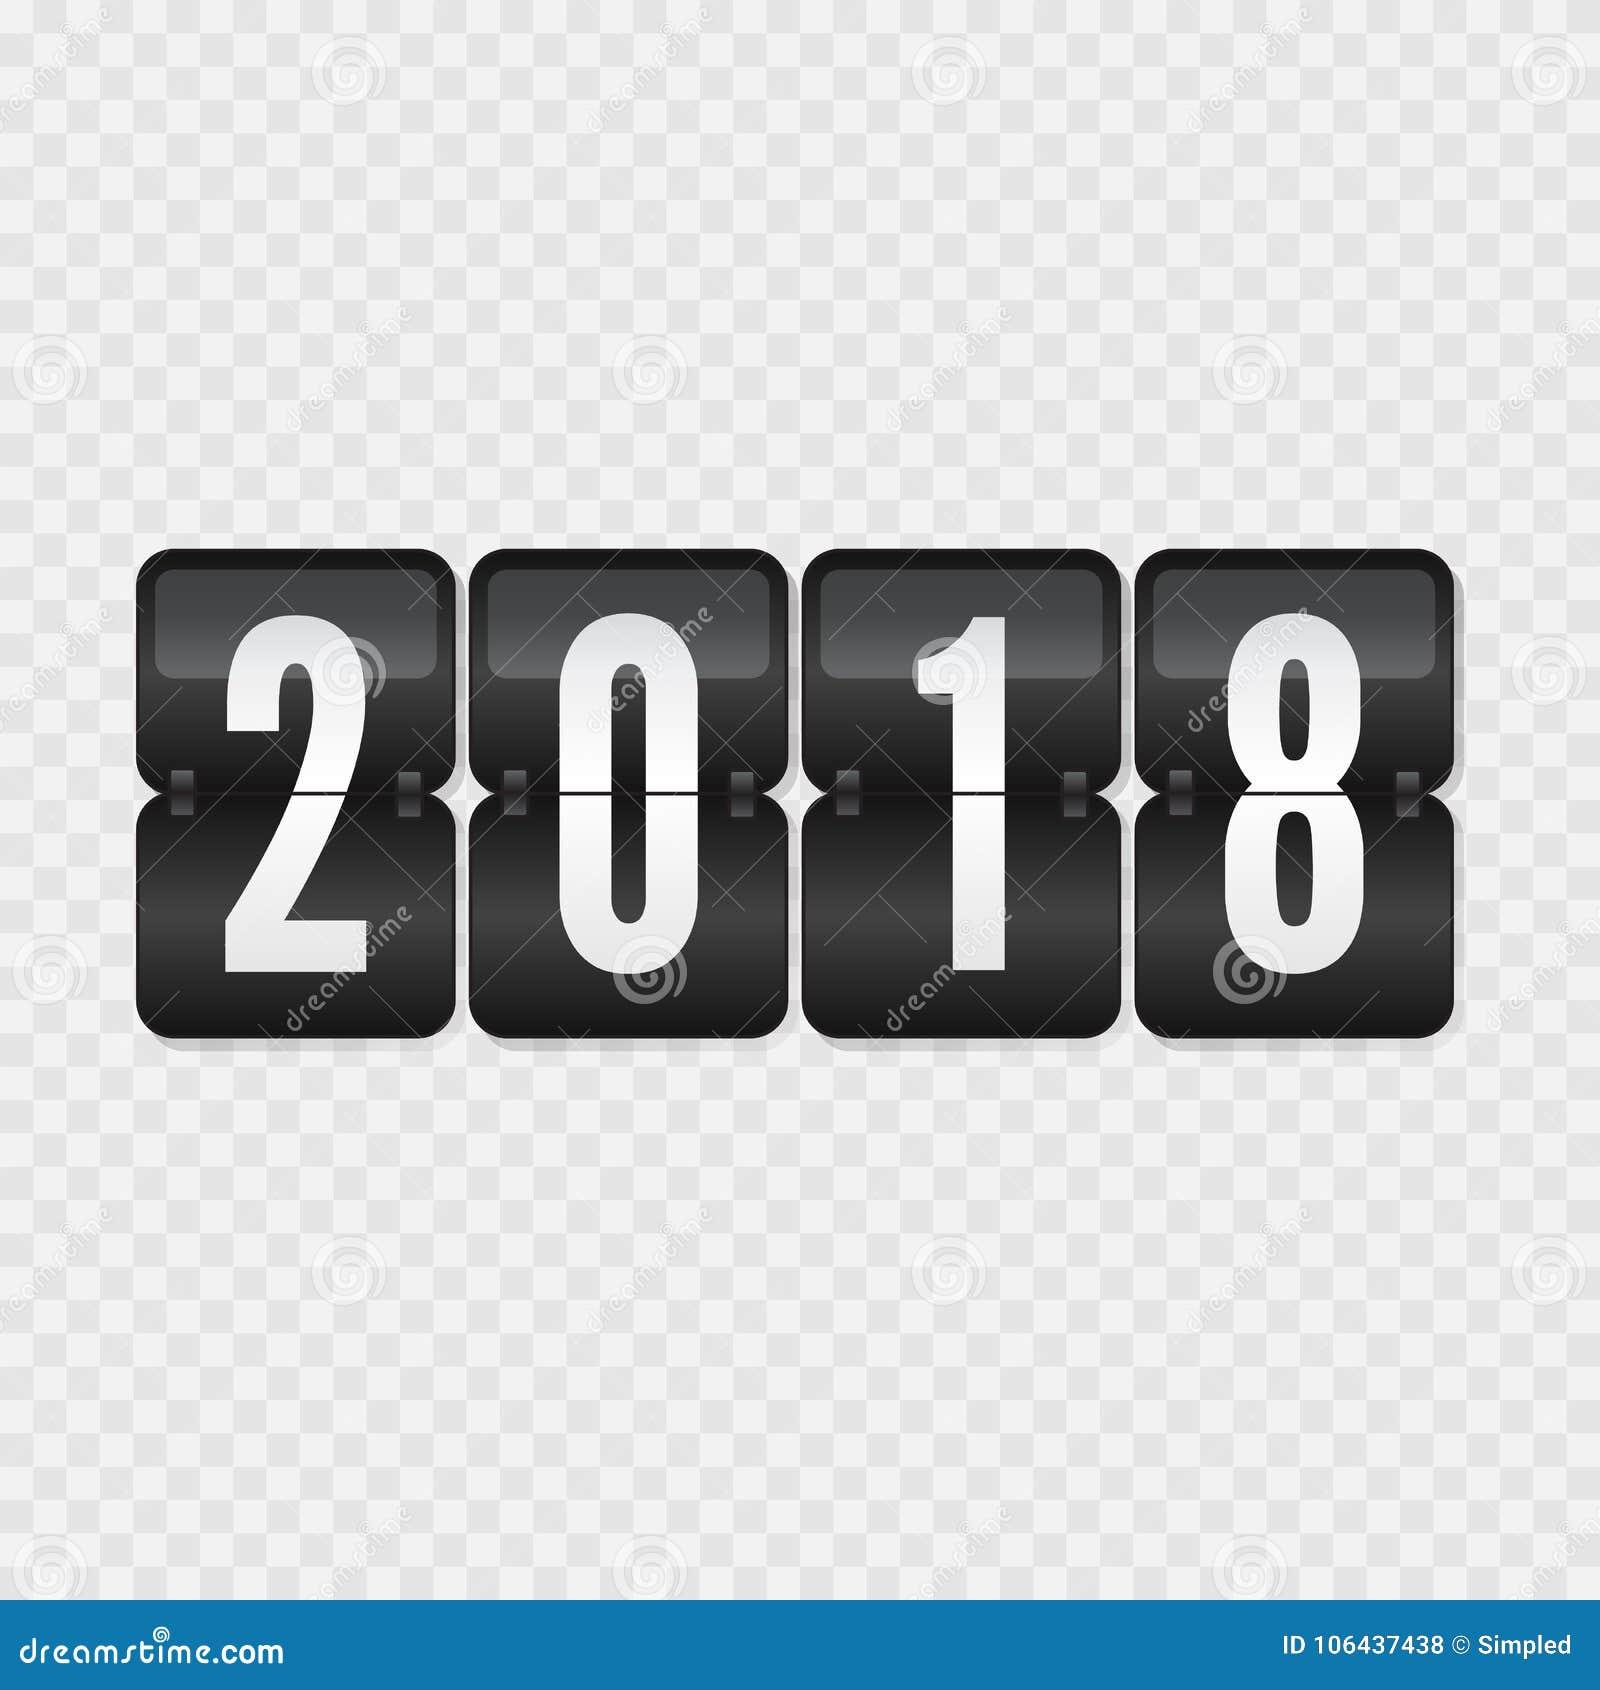 2018 happy new year scoreboard vector illustration flip symbol on transparent background